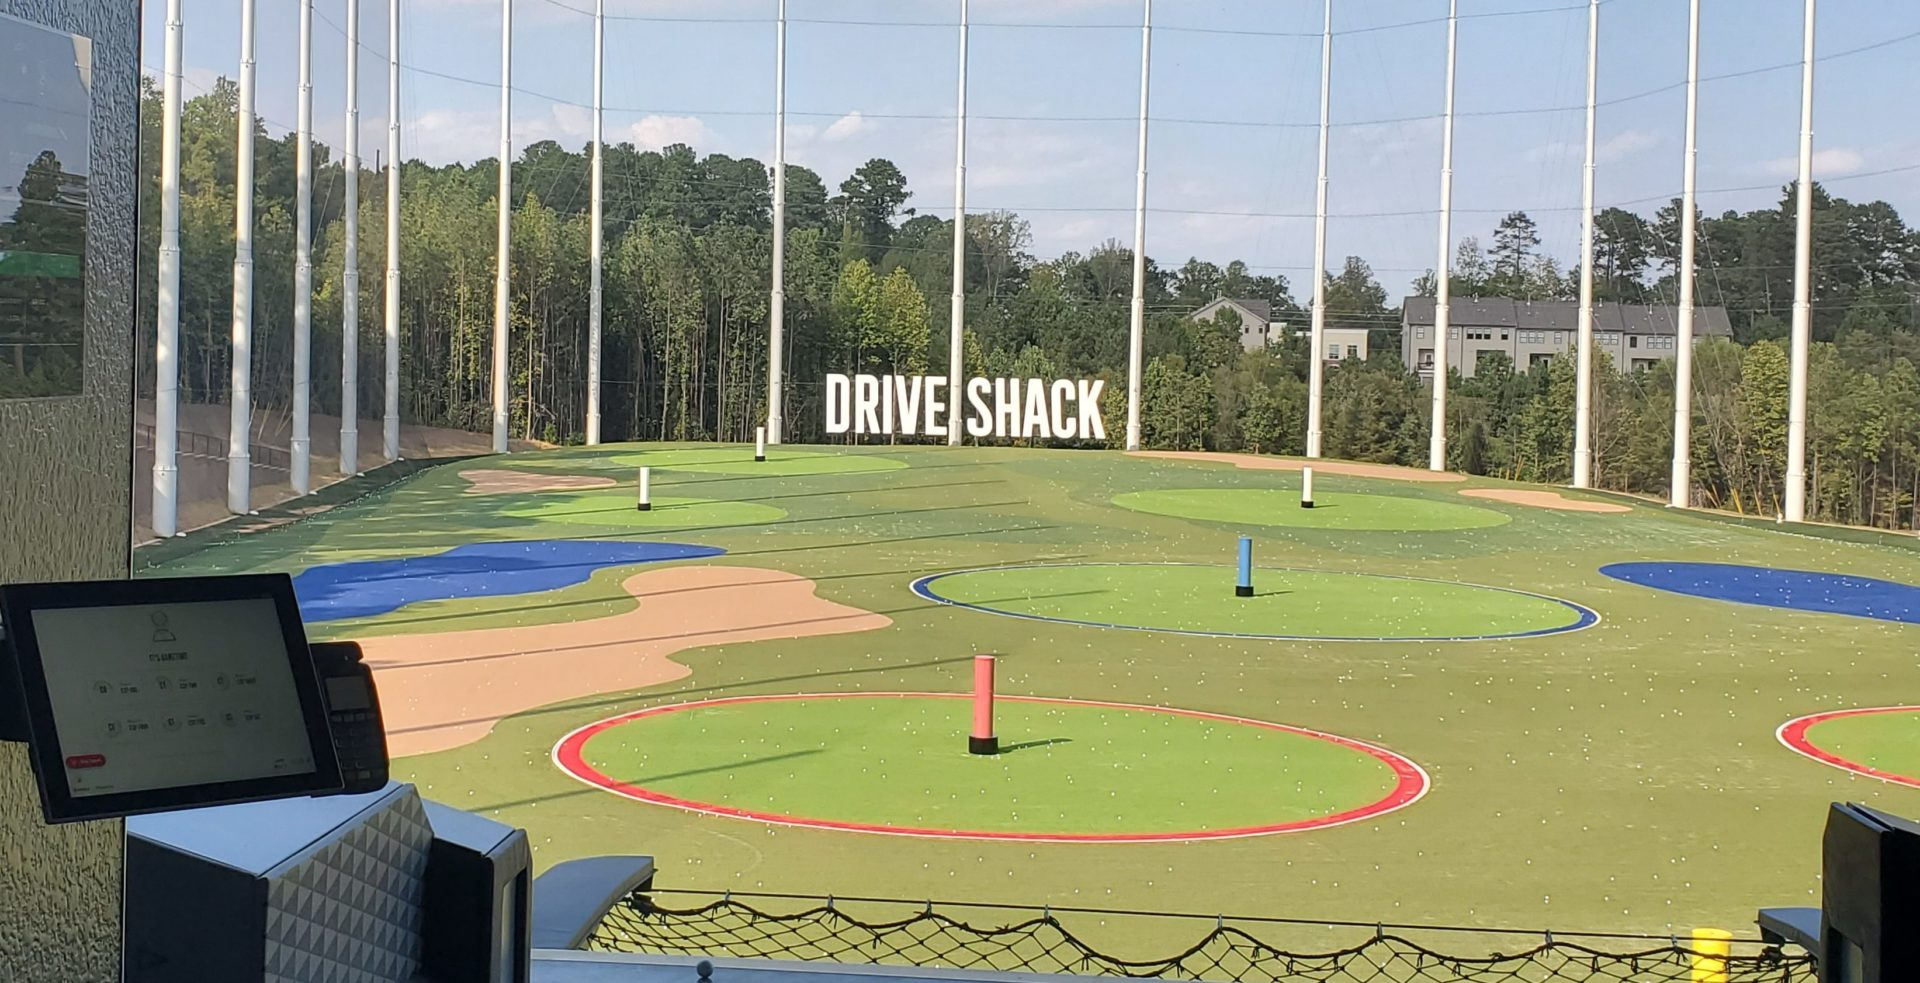 Drive Shack